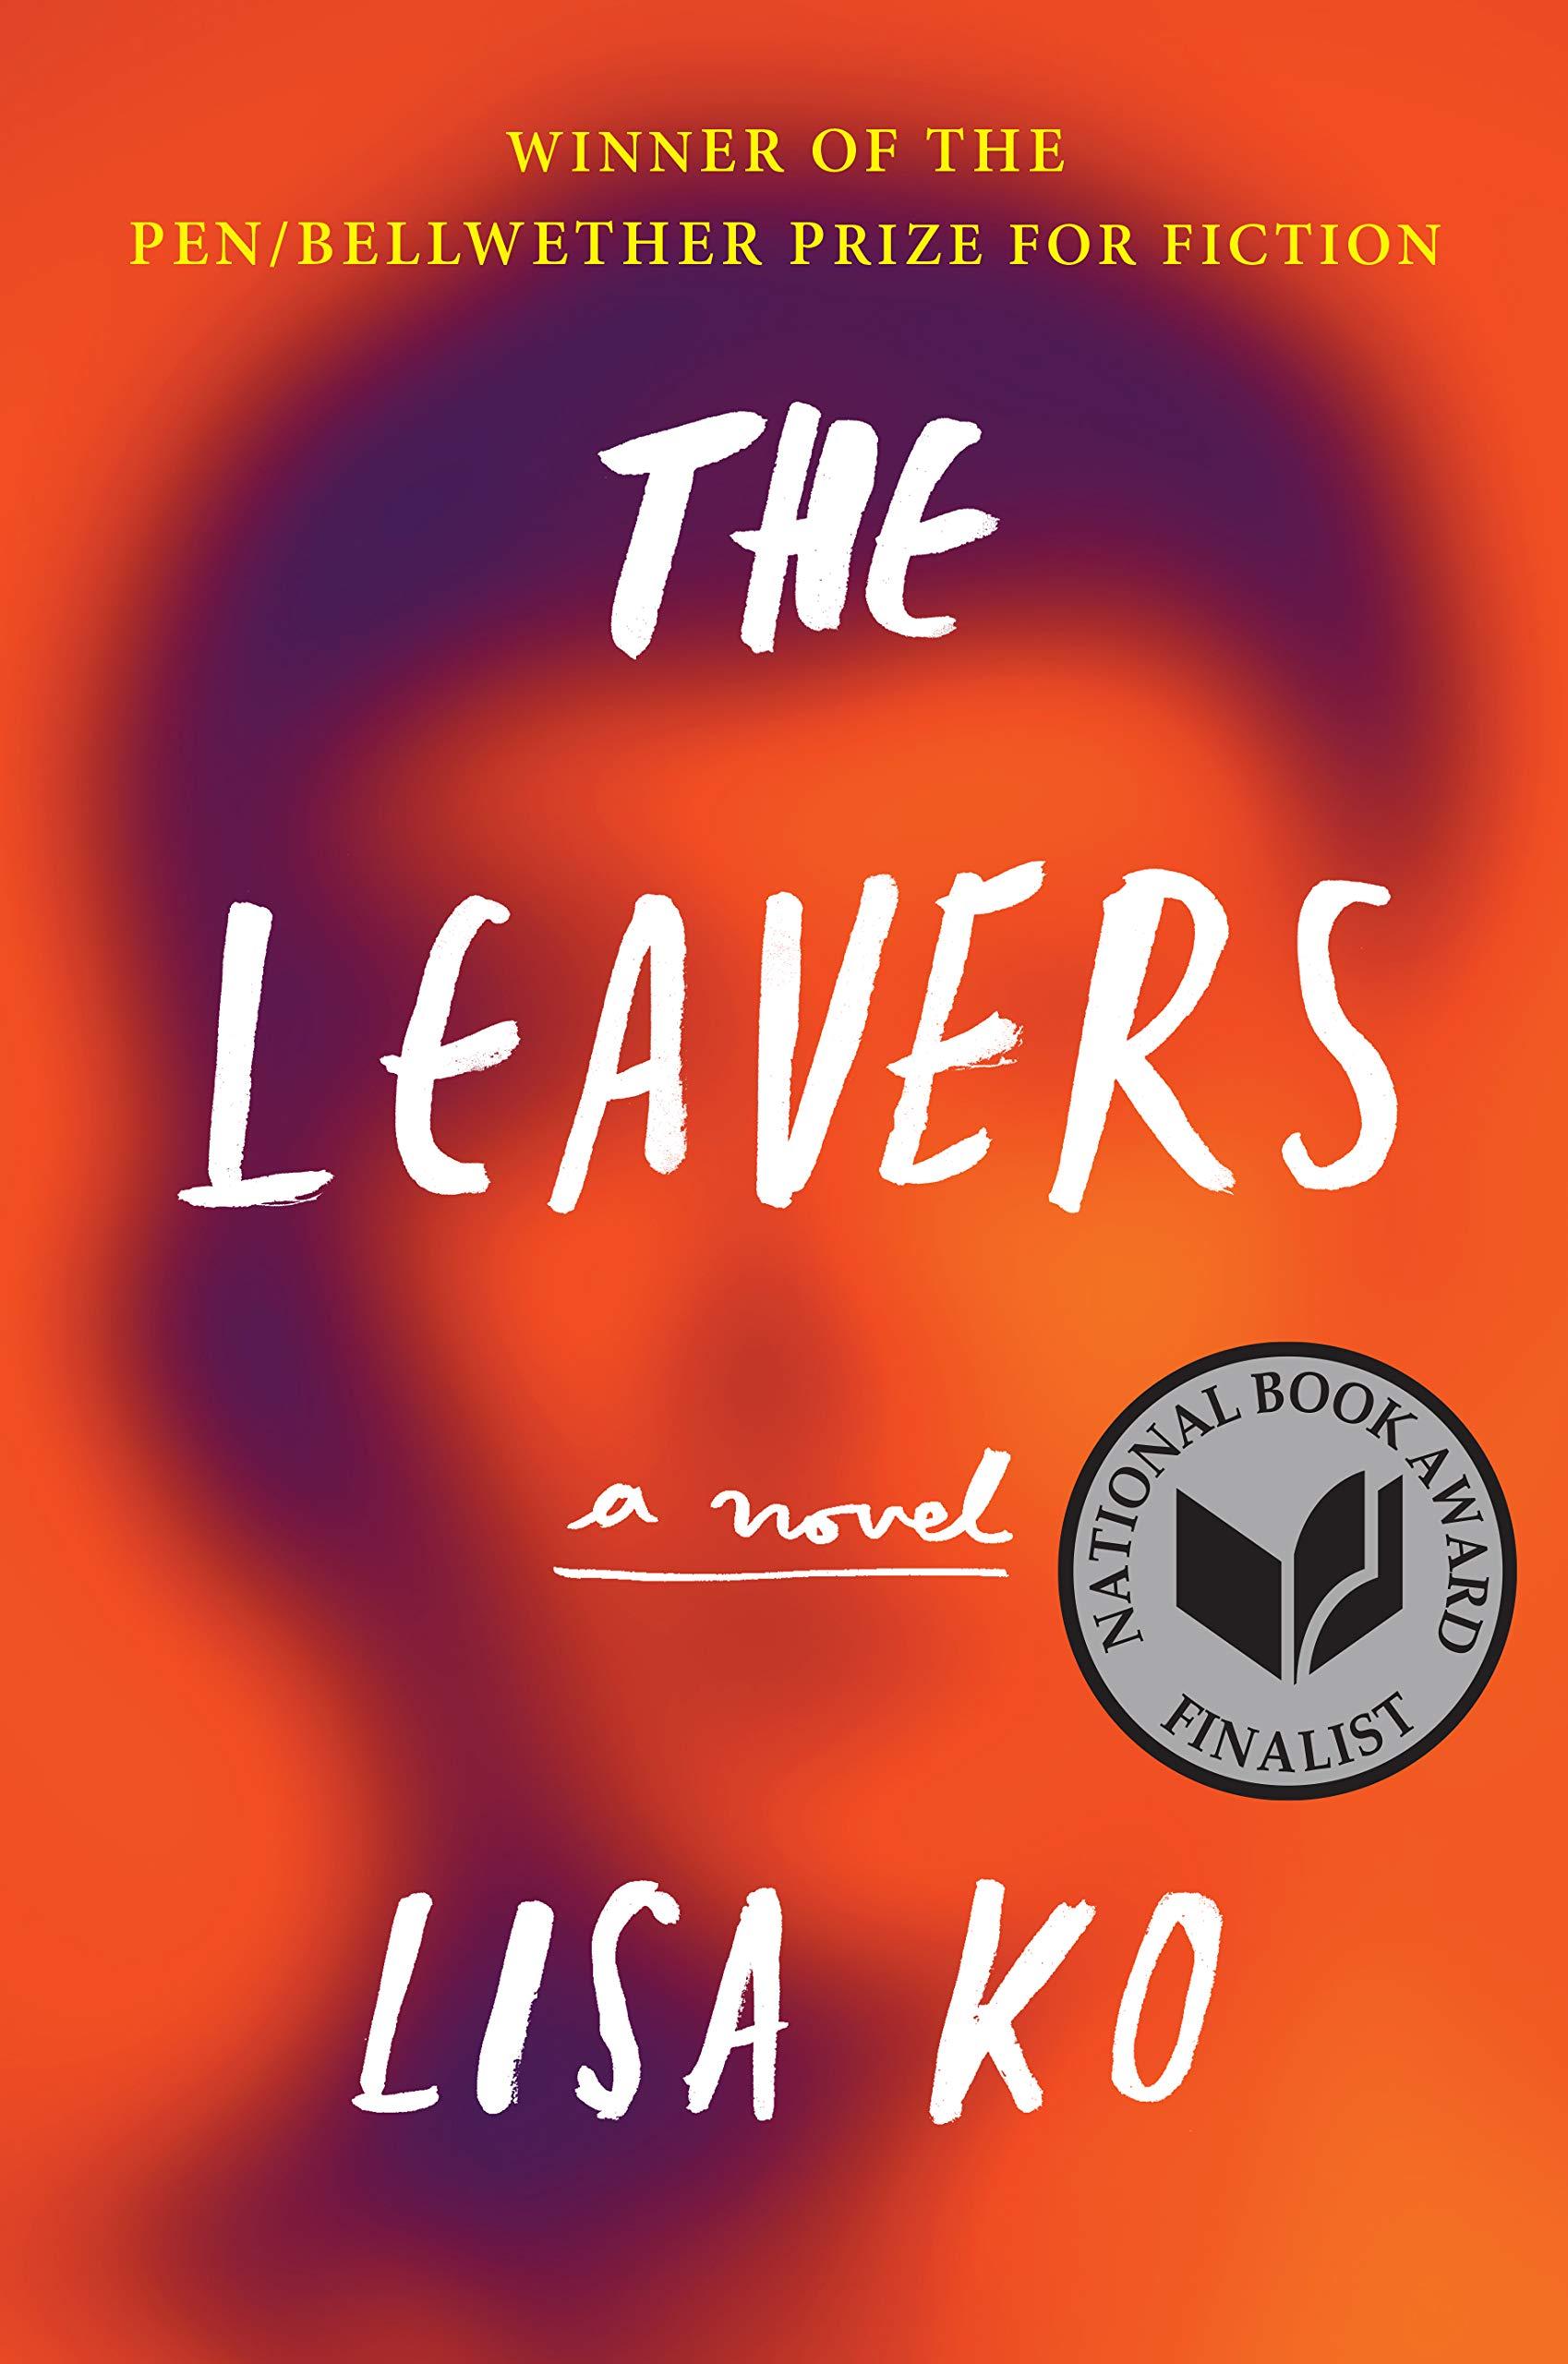 Leavers, The: Amazon.co.uk: Ko, Lisa: 9781616206888: Books